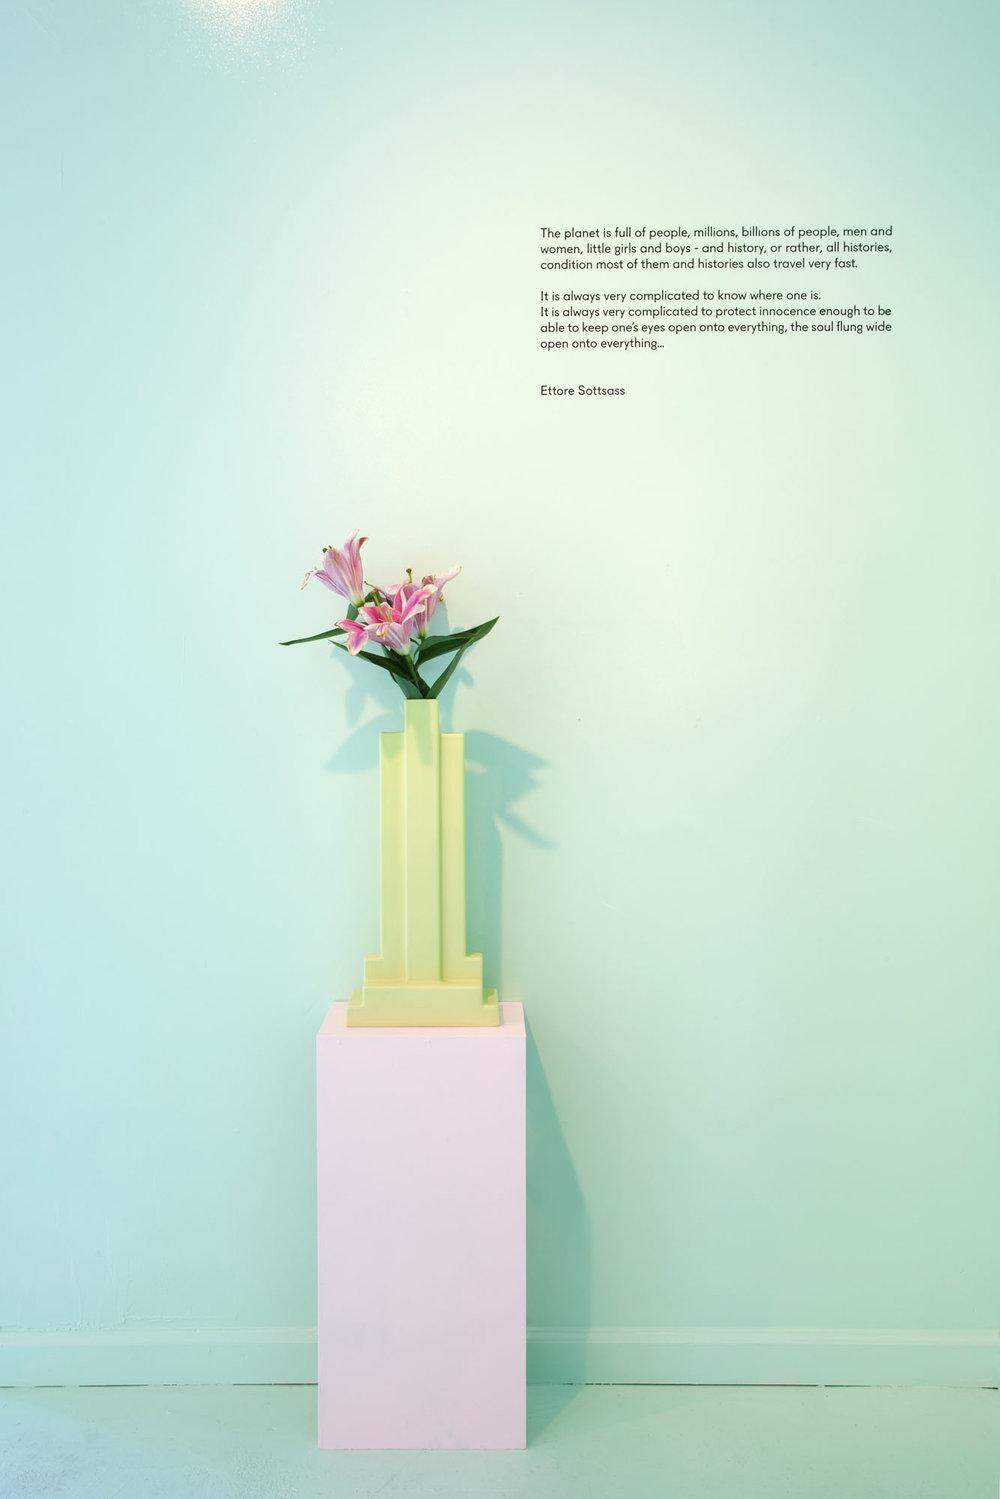 Ettore Sottsass Tantra Vase